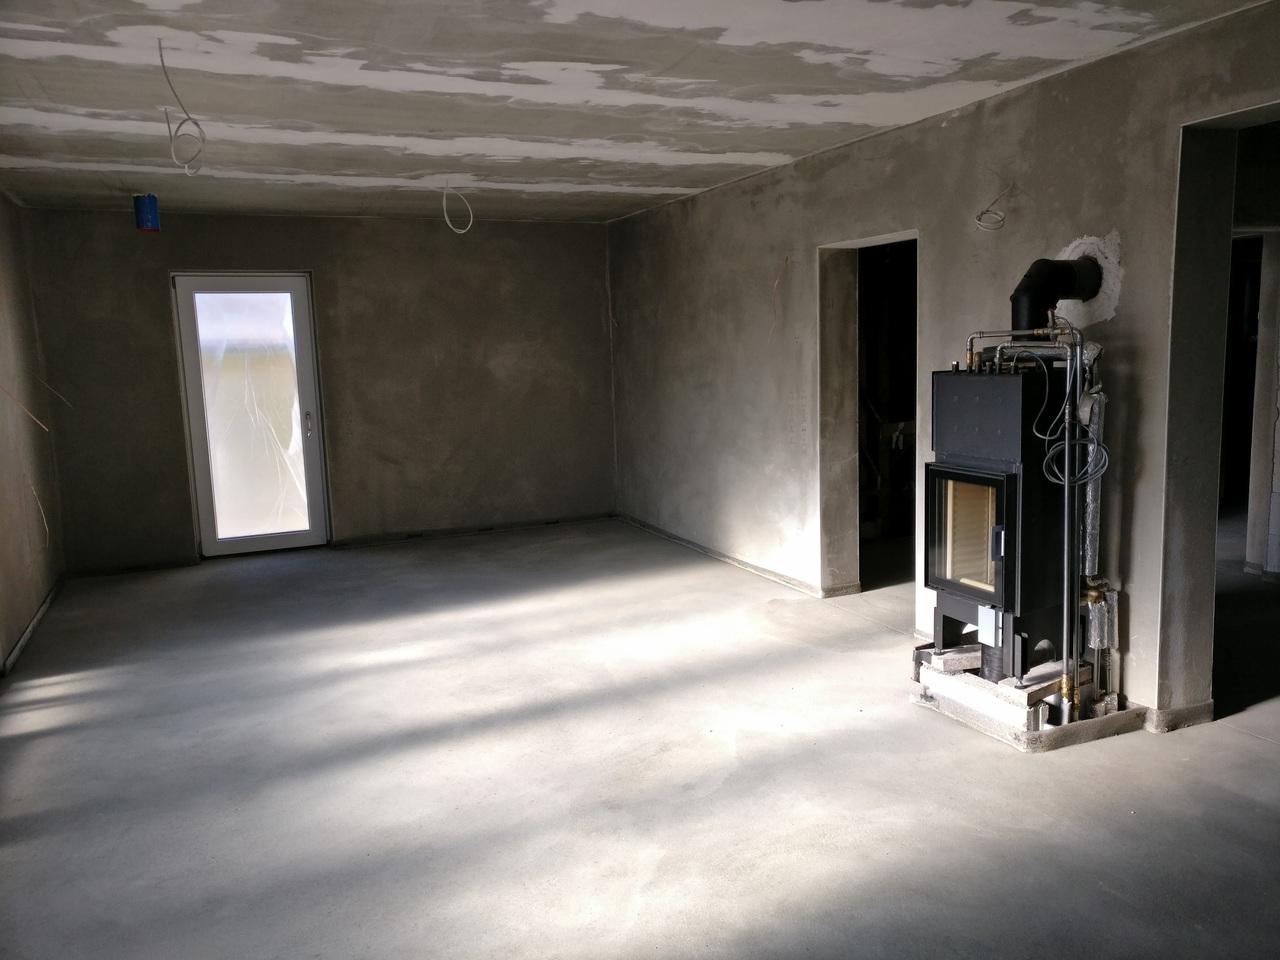 raumluftunabh ngiger kaminofen dibt zulassung haustechnikdialog. Black Bedroom Furniture Sets. Home Design Ideas